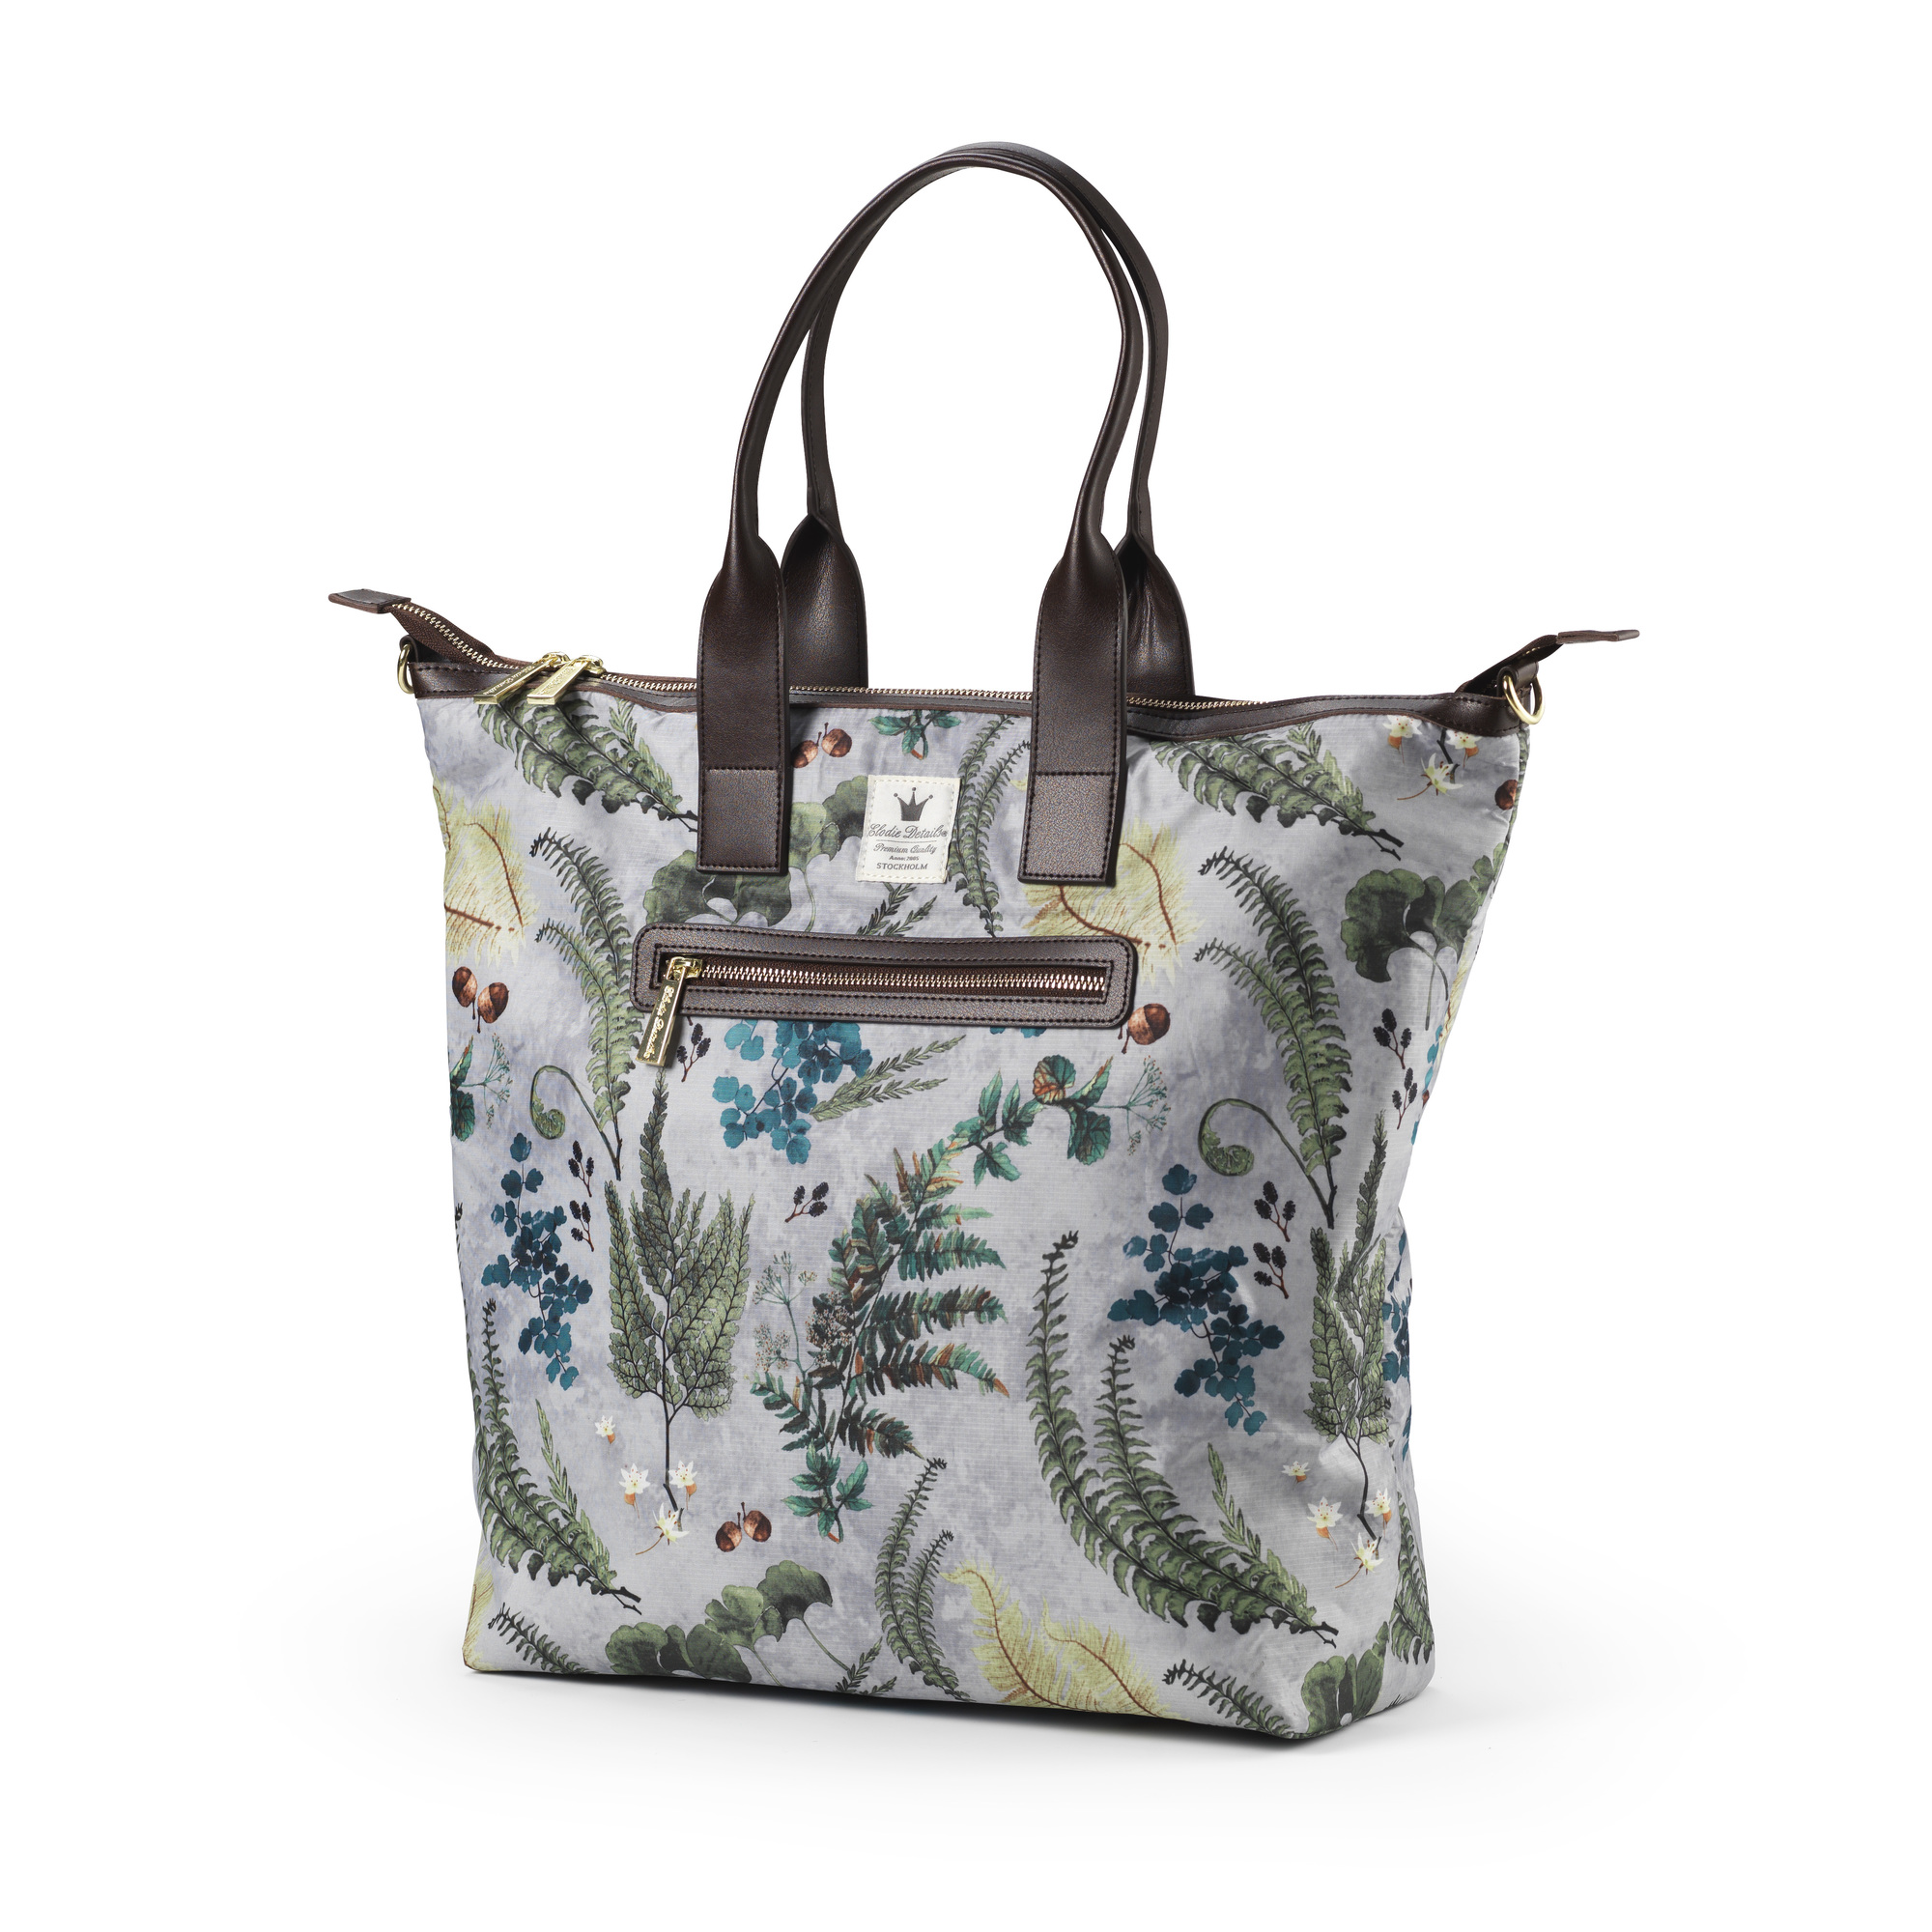 36f7e92357 Τσάντα αλλαγής - Lapin House